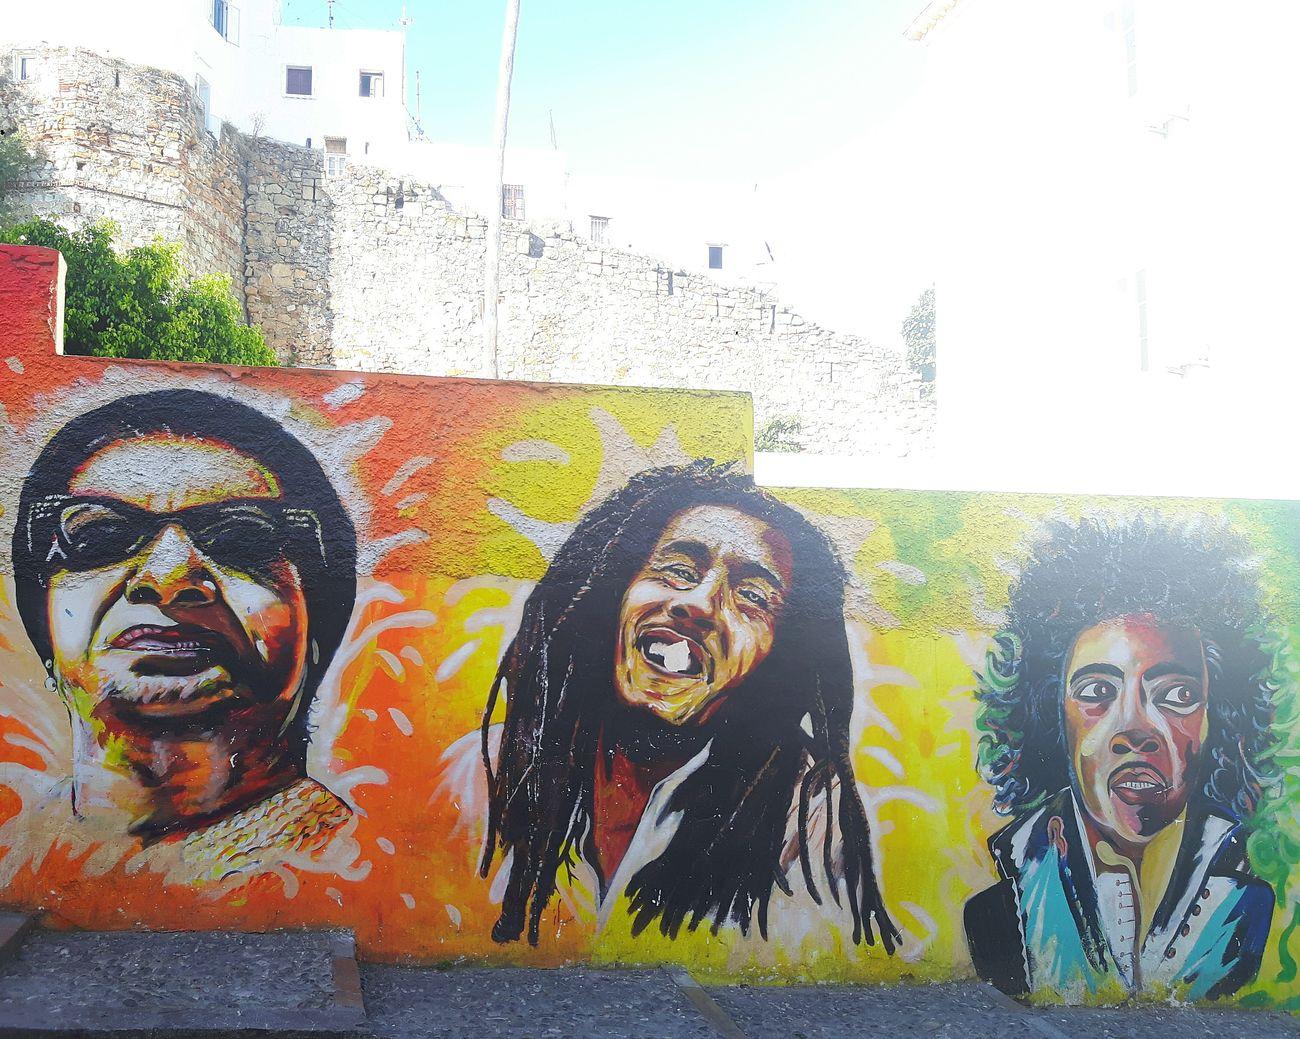 Street art Bobmarley OmKalthoum Michael Jackson Colorful Oldmadina Tangier Old City Art Streetart Streetphotography Colors